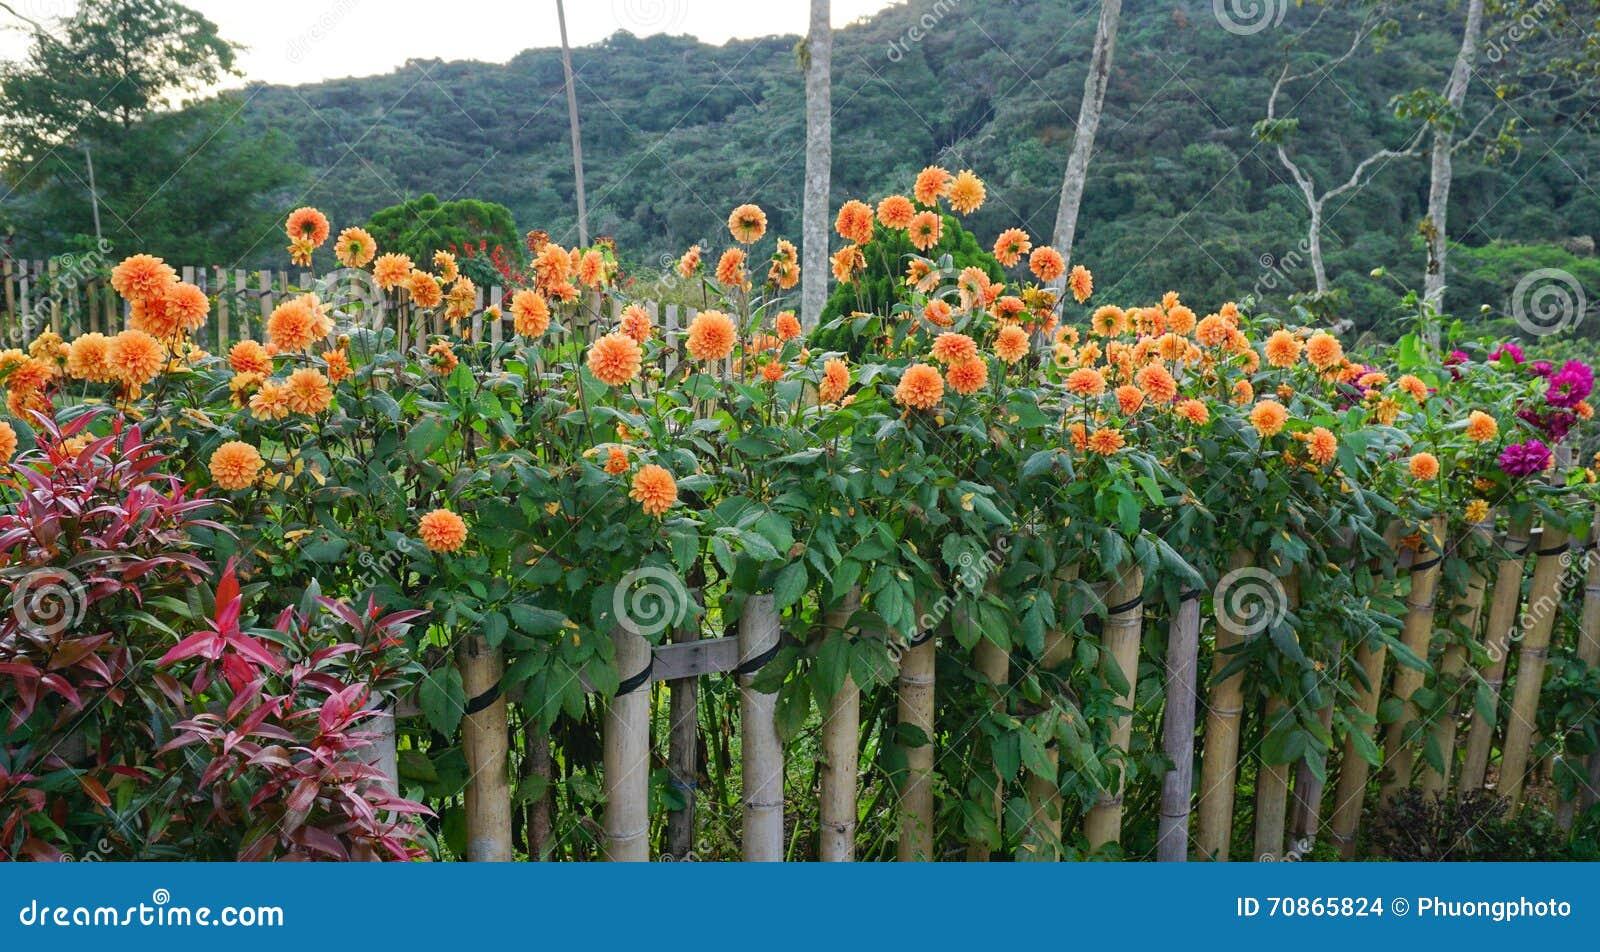 Dahlia Flowers At The Garden Stock Photo Image Of Dahlia Hill 70865824